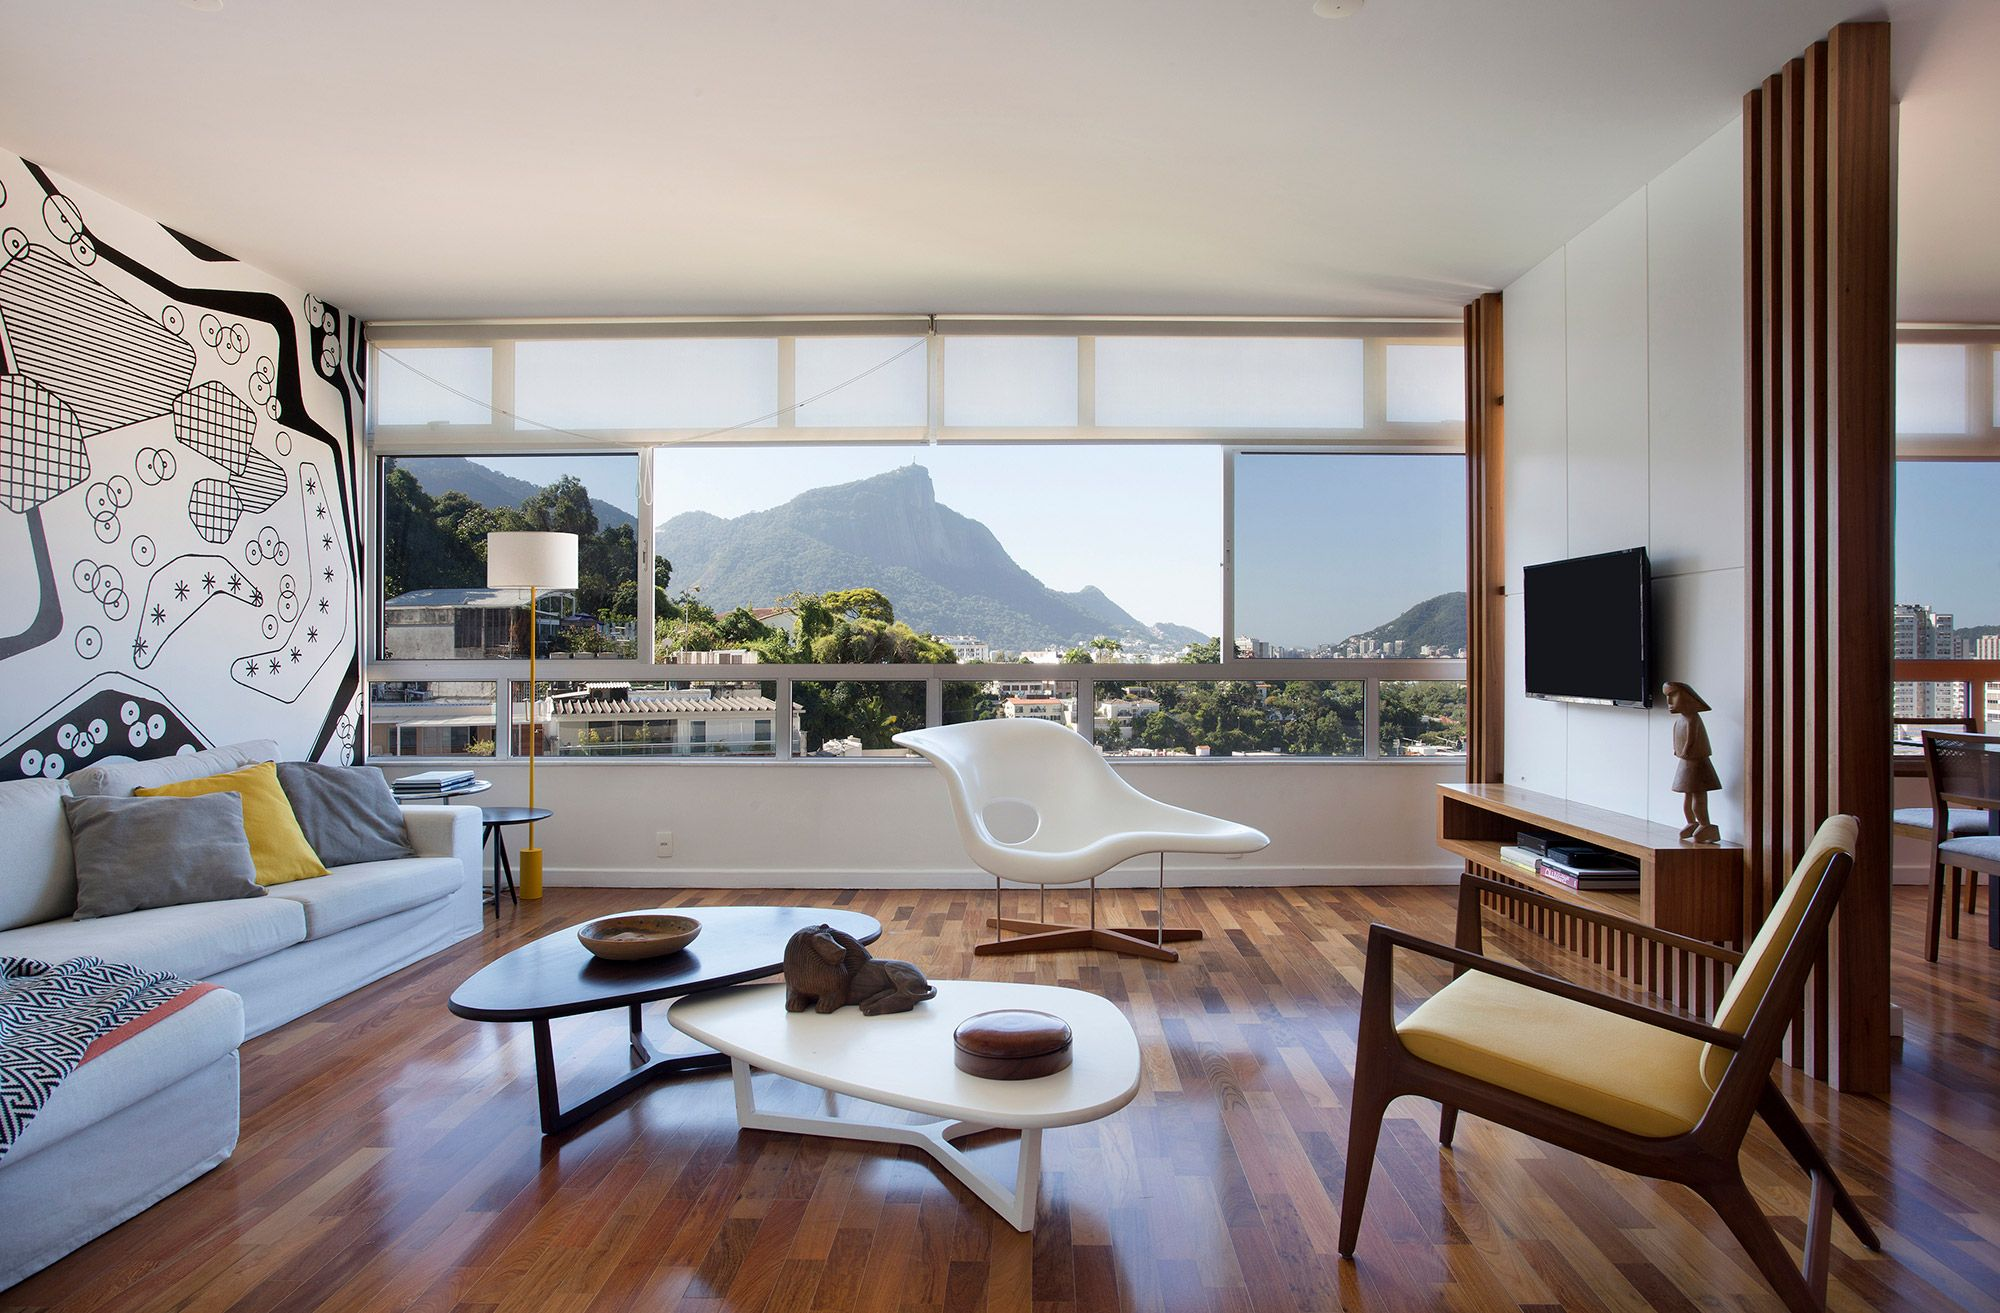 Apartamento no Rio mescla elementos franceses e cariocas no décor